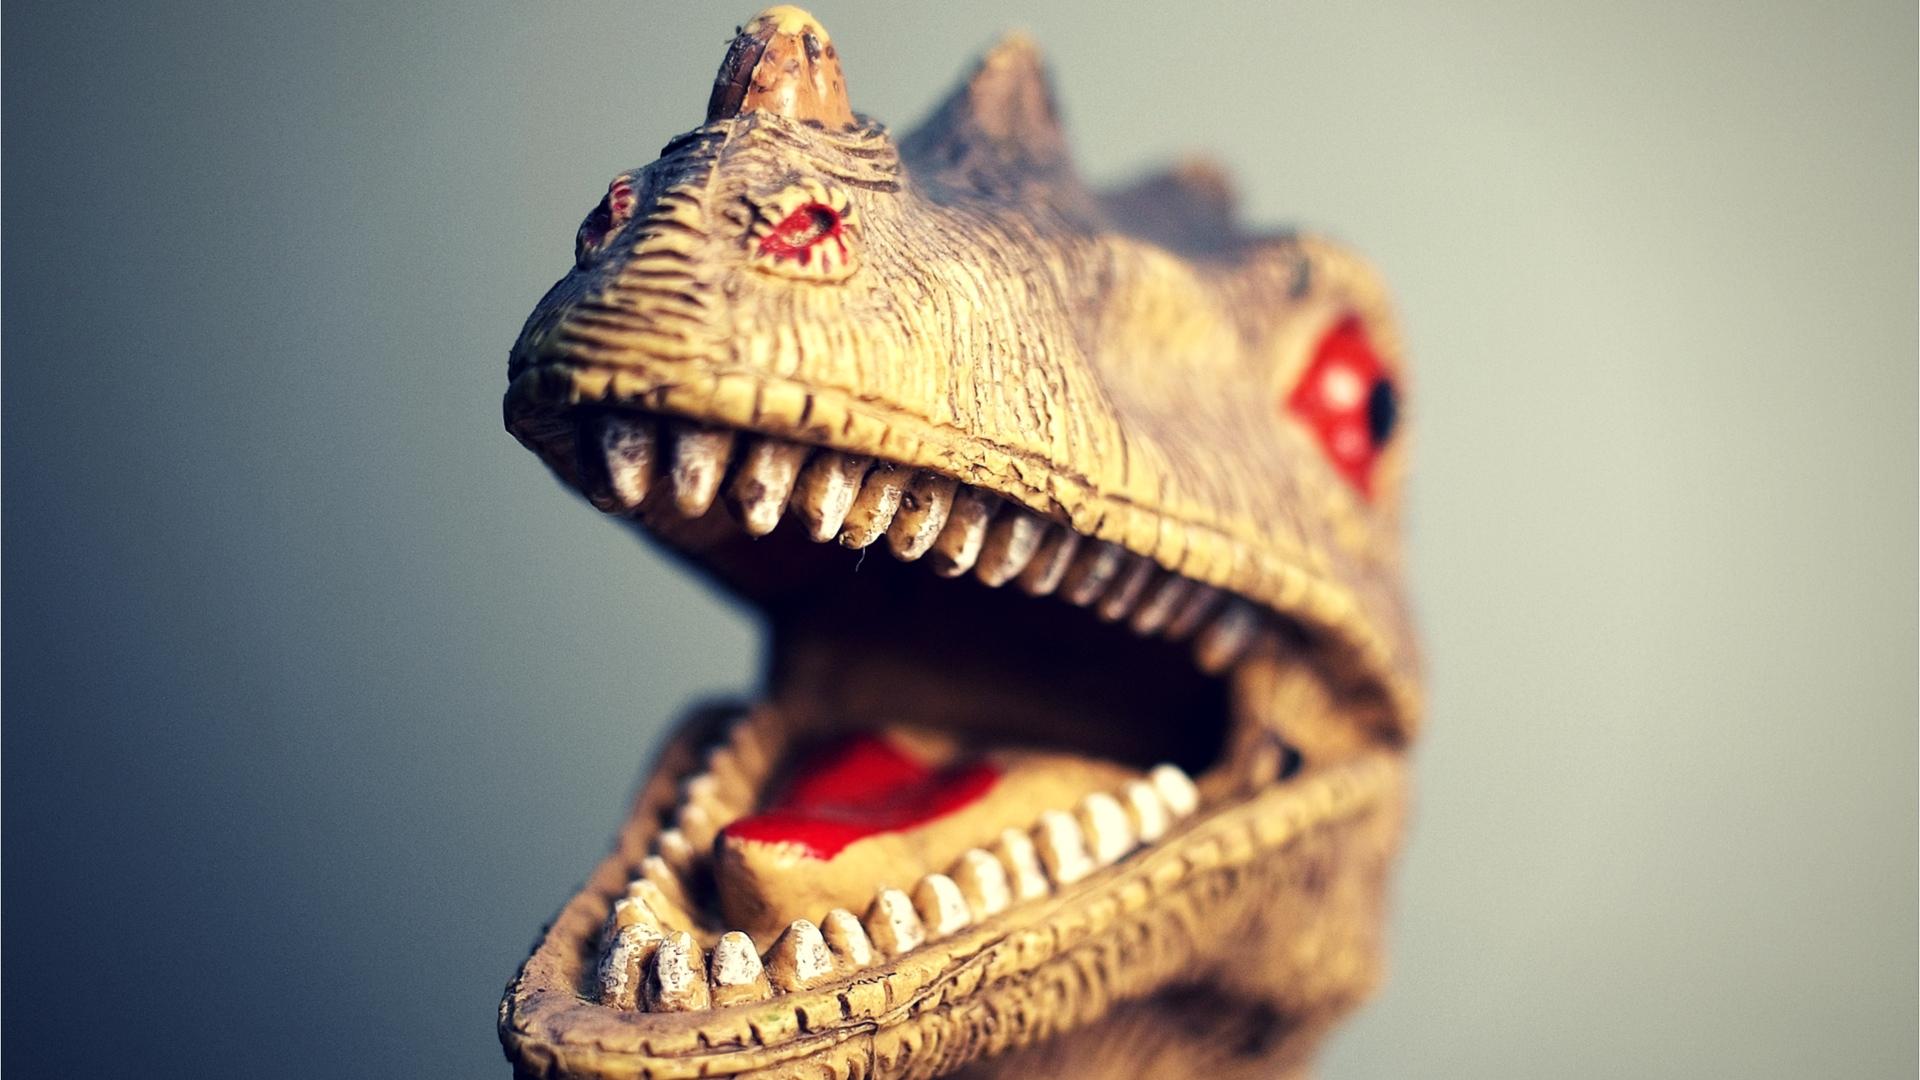 King Dump and the Great Dinosaur Ban